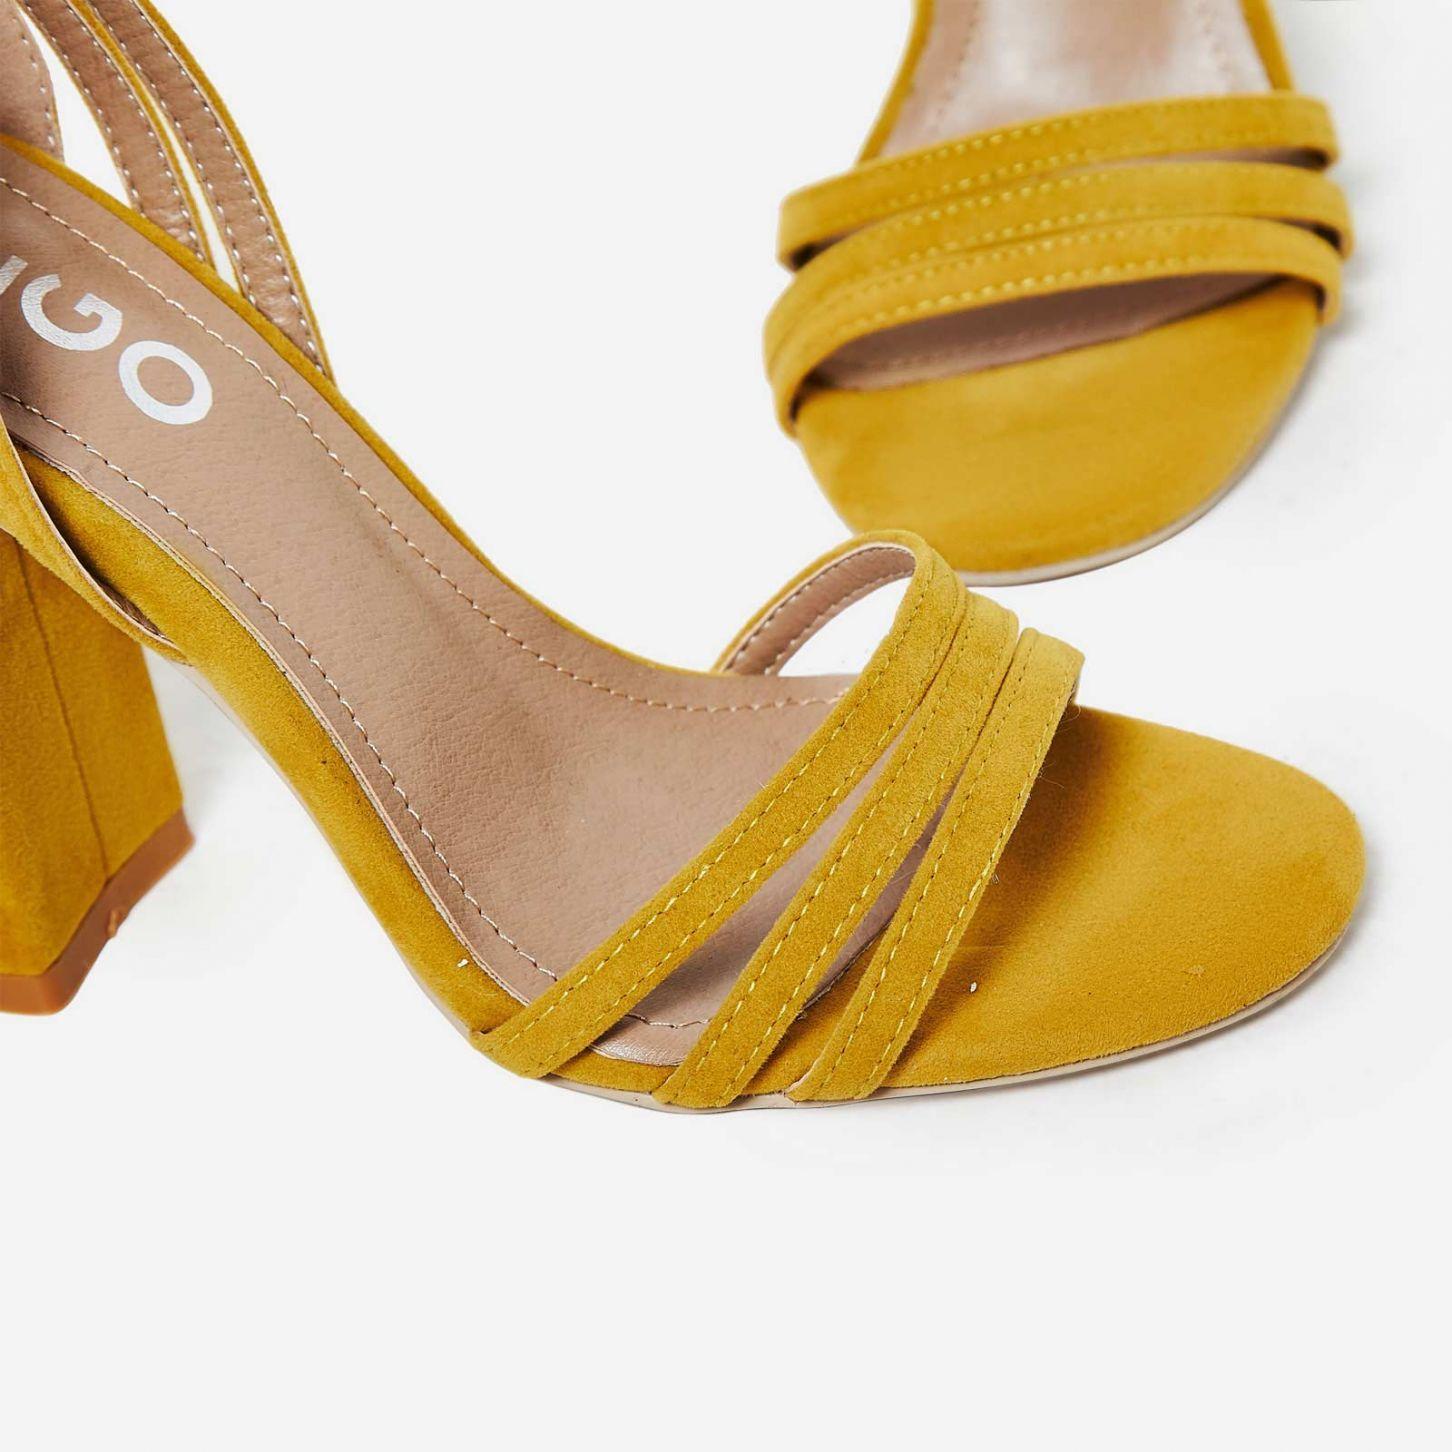 755275d7de5 Sydney Strappy Lace Up Block Heel In Mustard Faux Suede | S H O E S ...